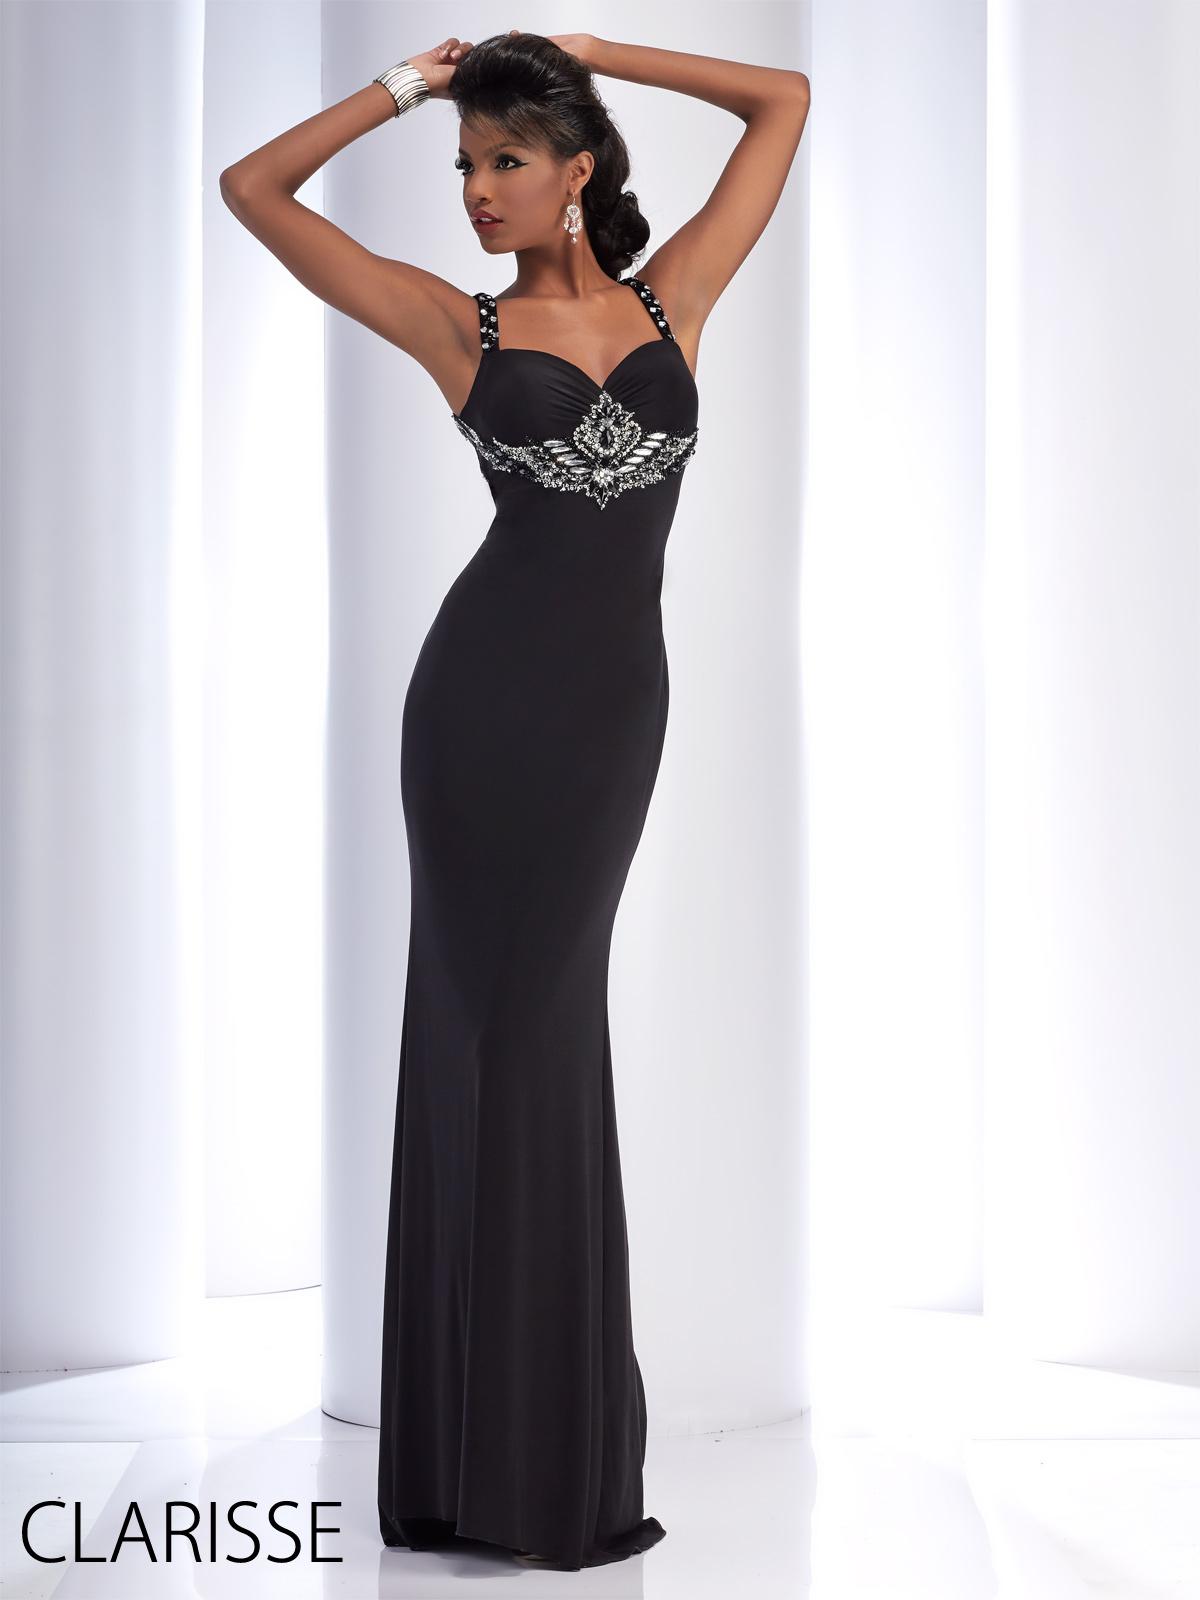 Clarisse 2016 long prom dress style 2759. Unique, beautiful silver ...